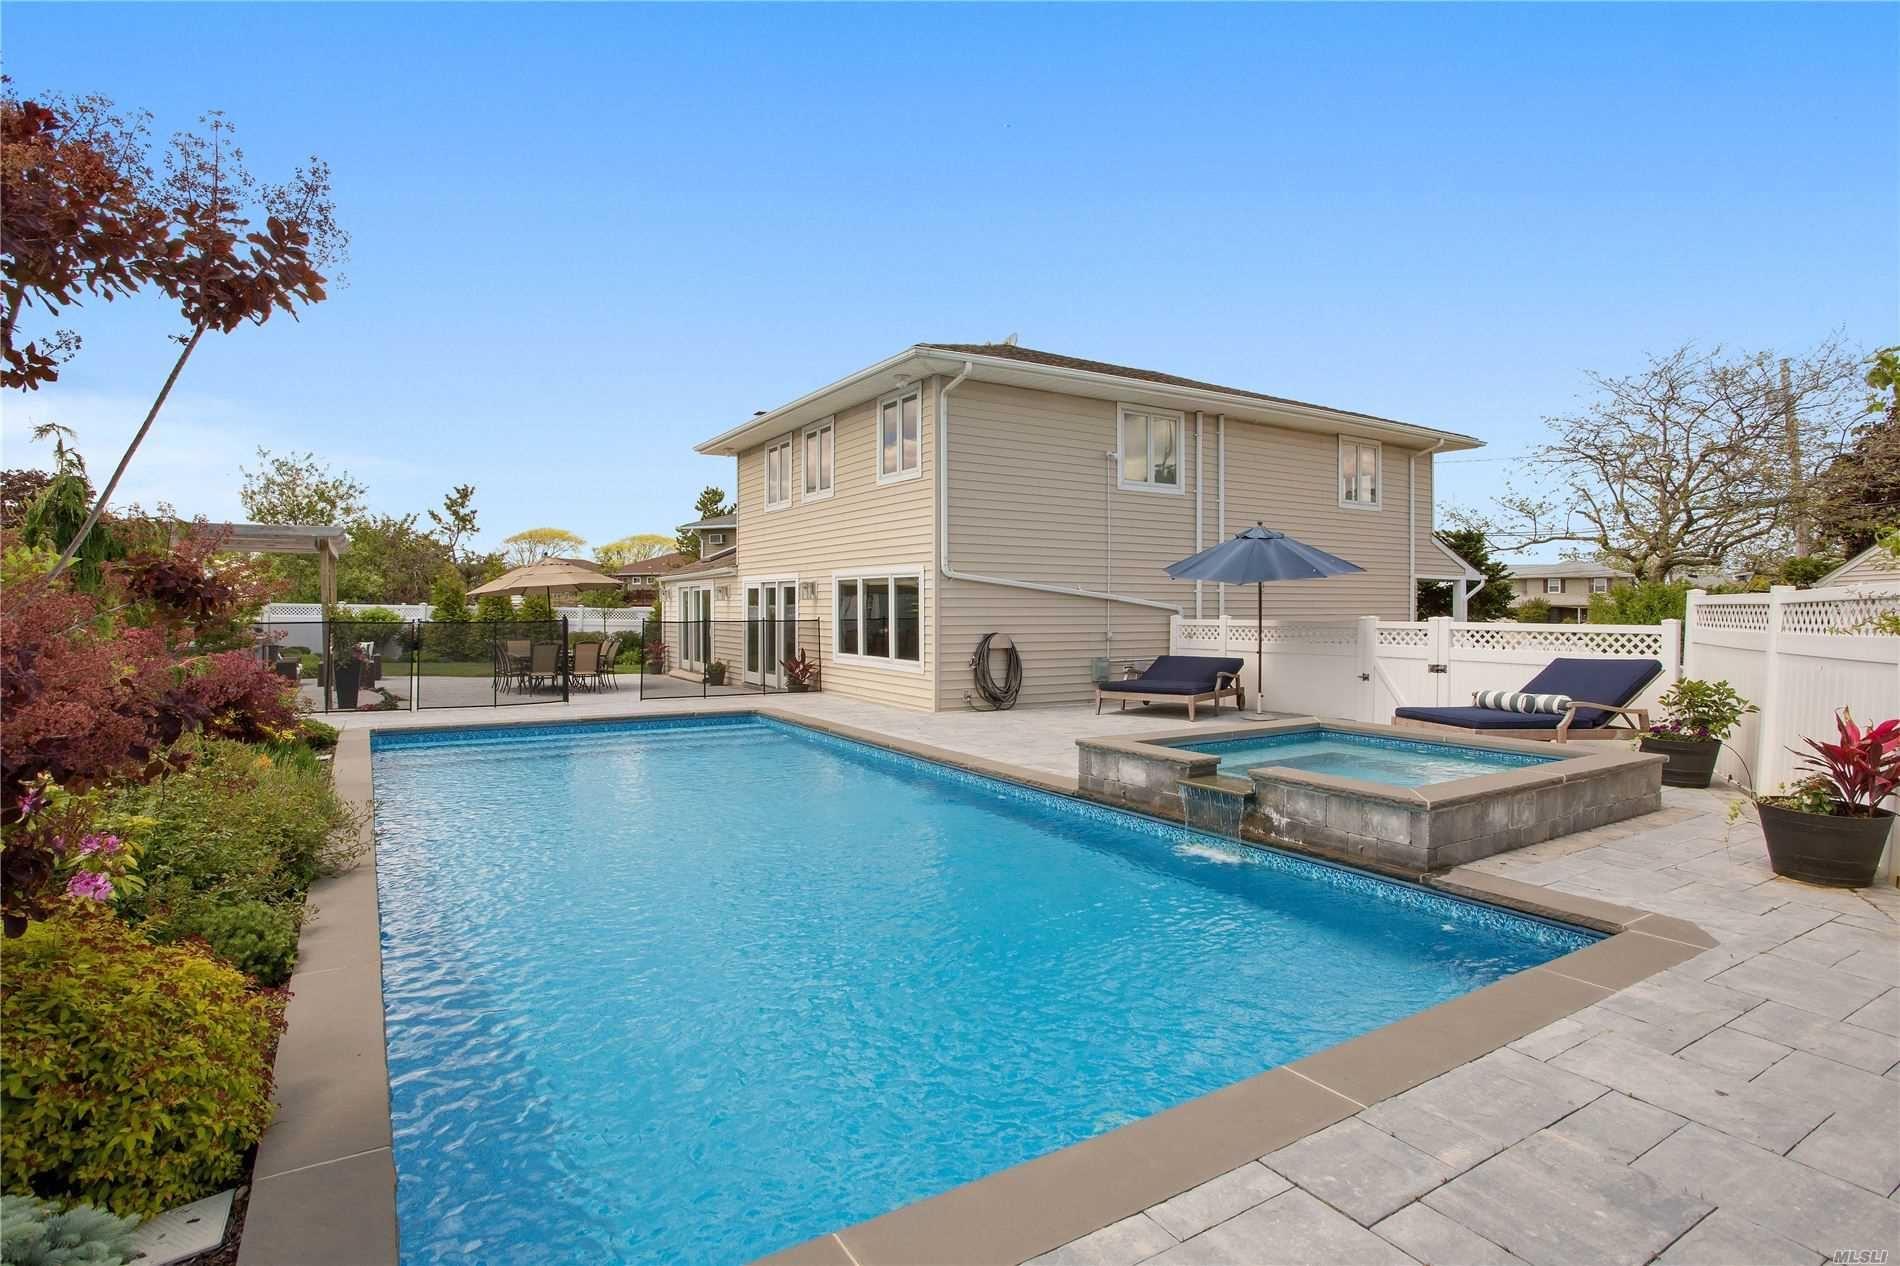 87 Sands Court, Lido Beach, NY 11561 - MLS#: 3196945